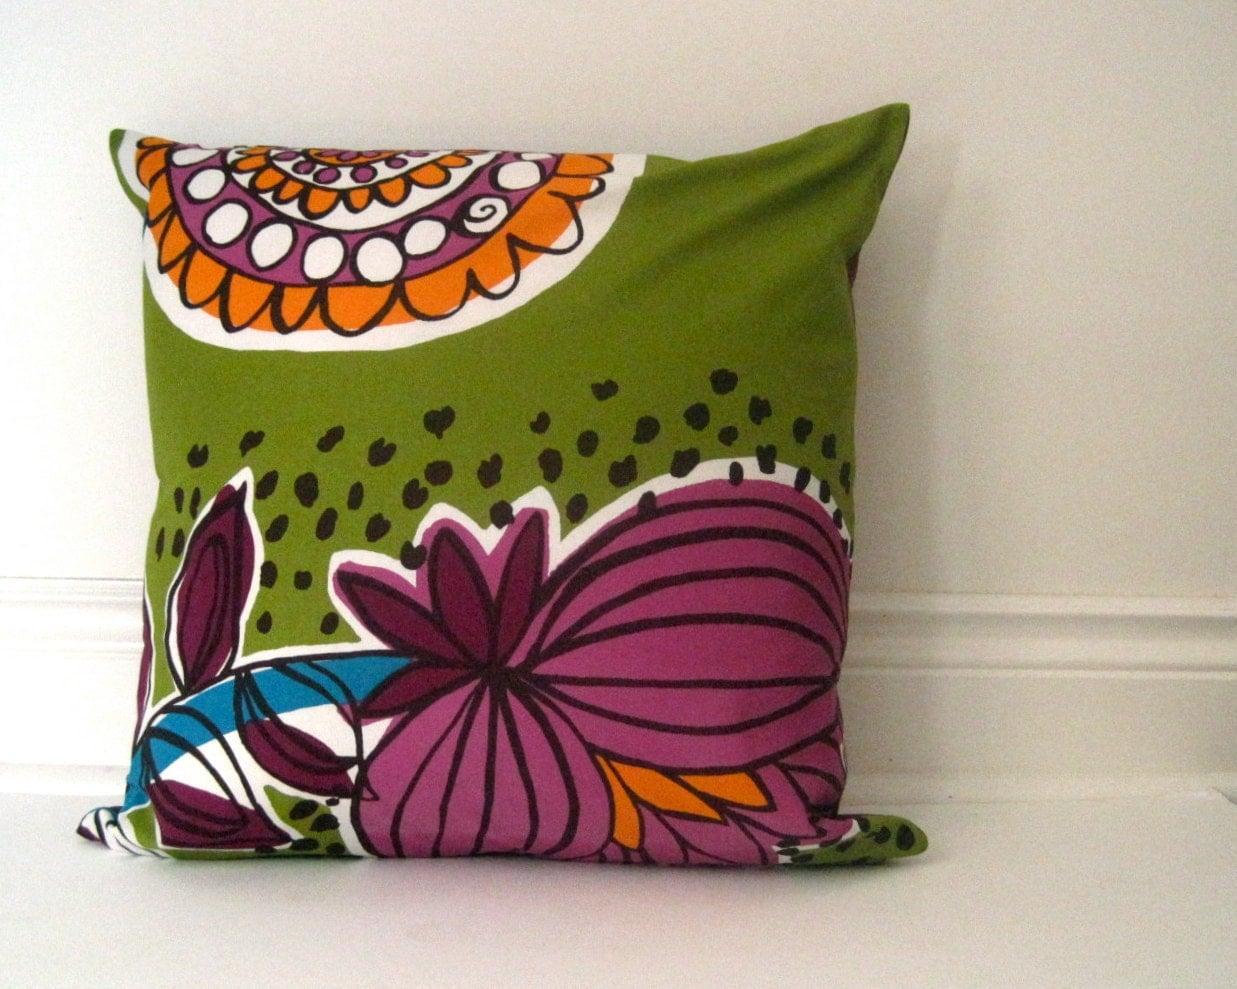 Marimekko throw pillow cover decorative mod purple by SewnNatural